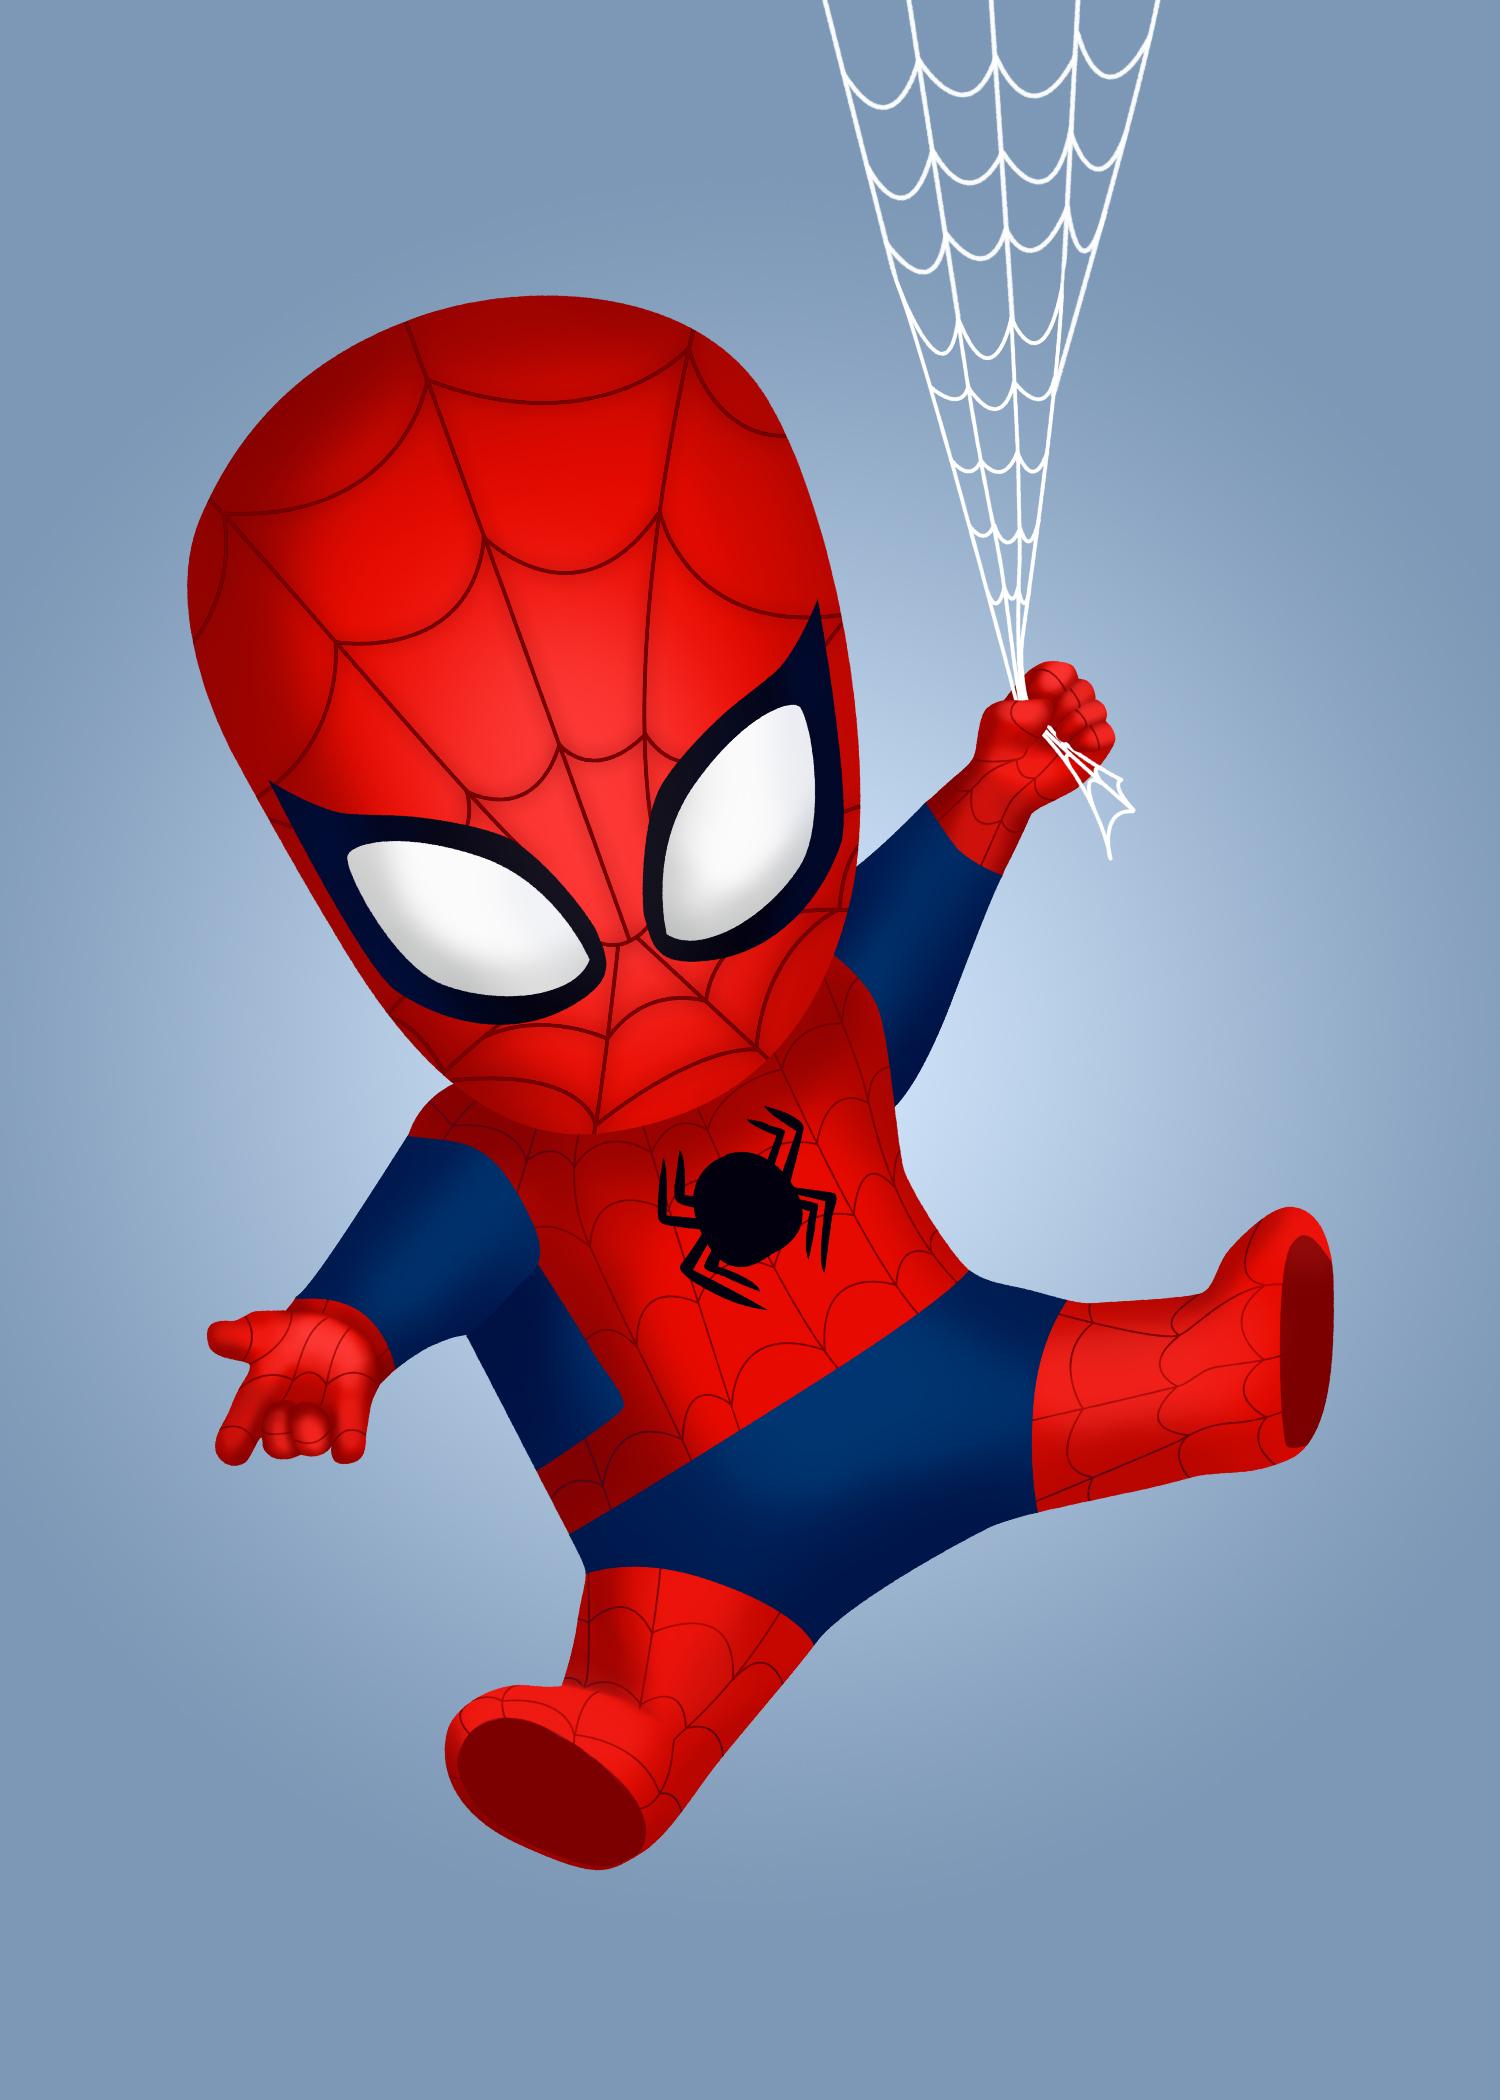 Chibi Spiderman. 2017.